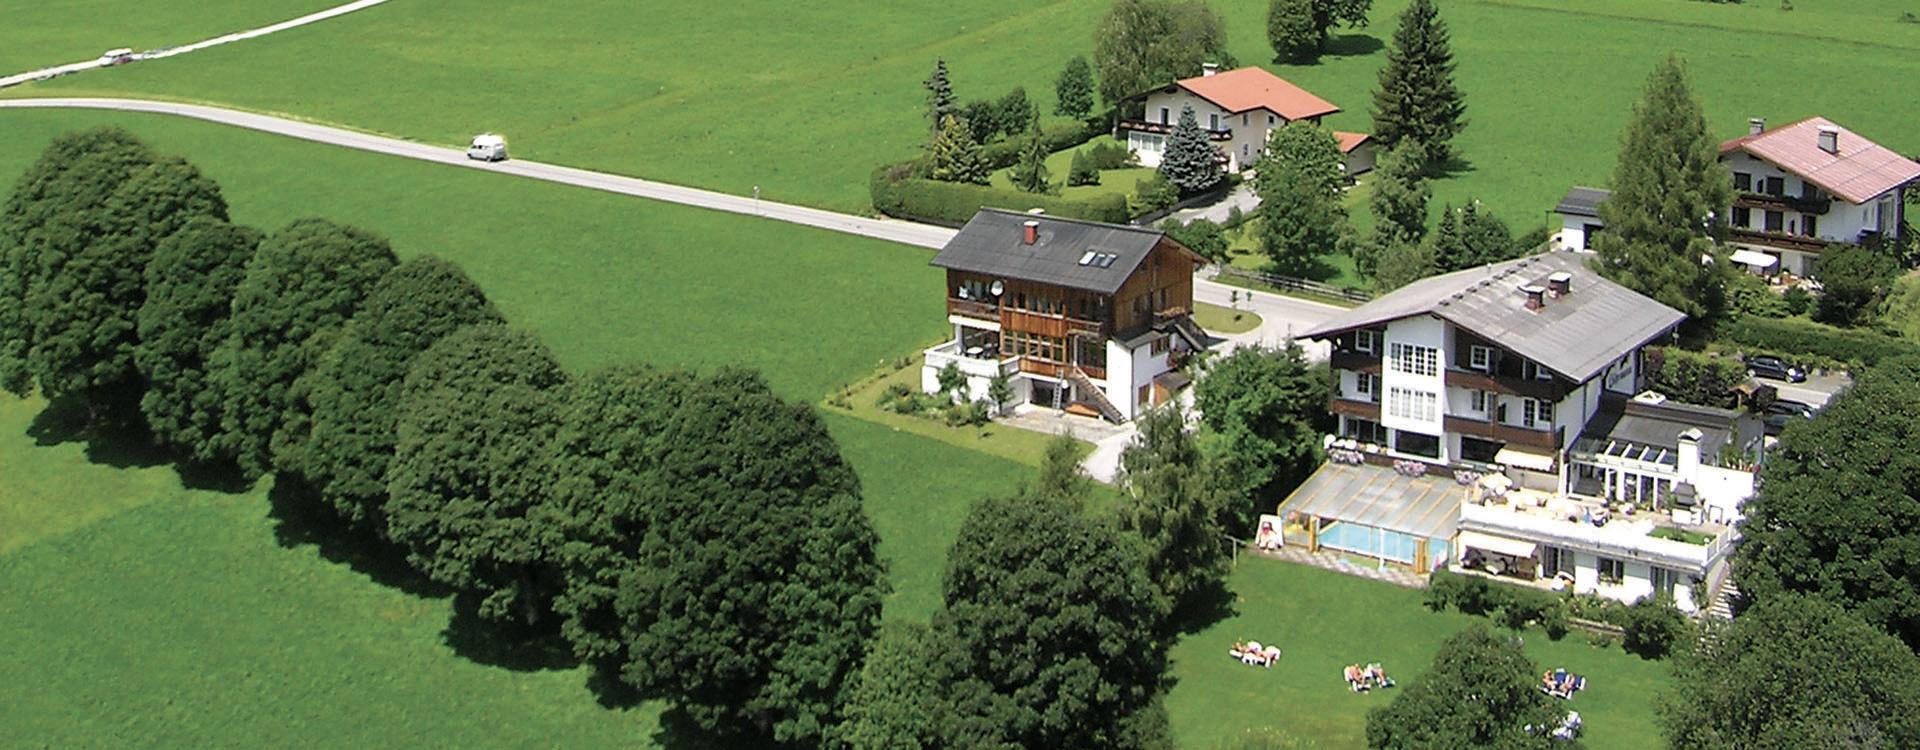 http://landhaus-luehrmann.at/wp/wp-content/uploads/2015/09/l%C3%BChrmann_luft_edited.jpg